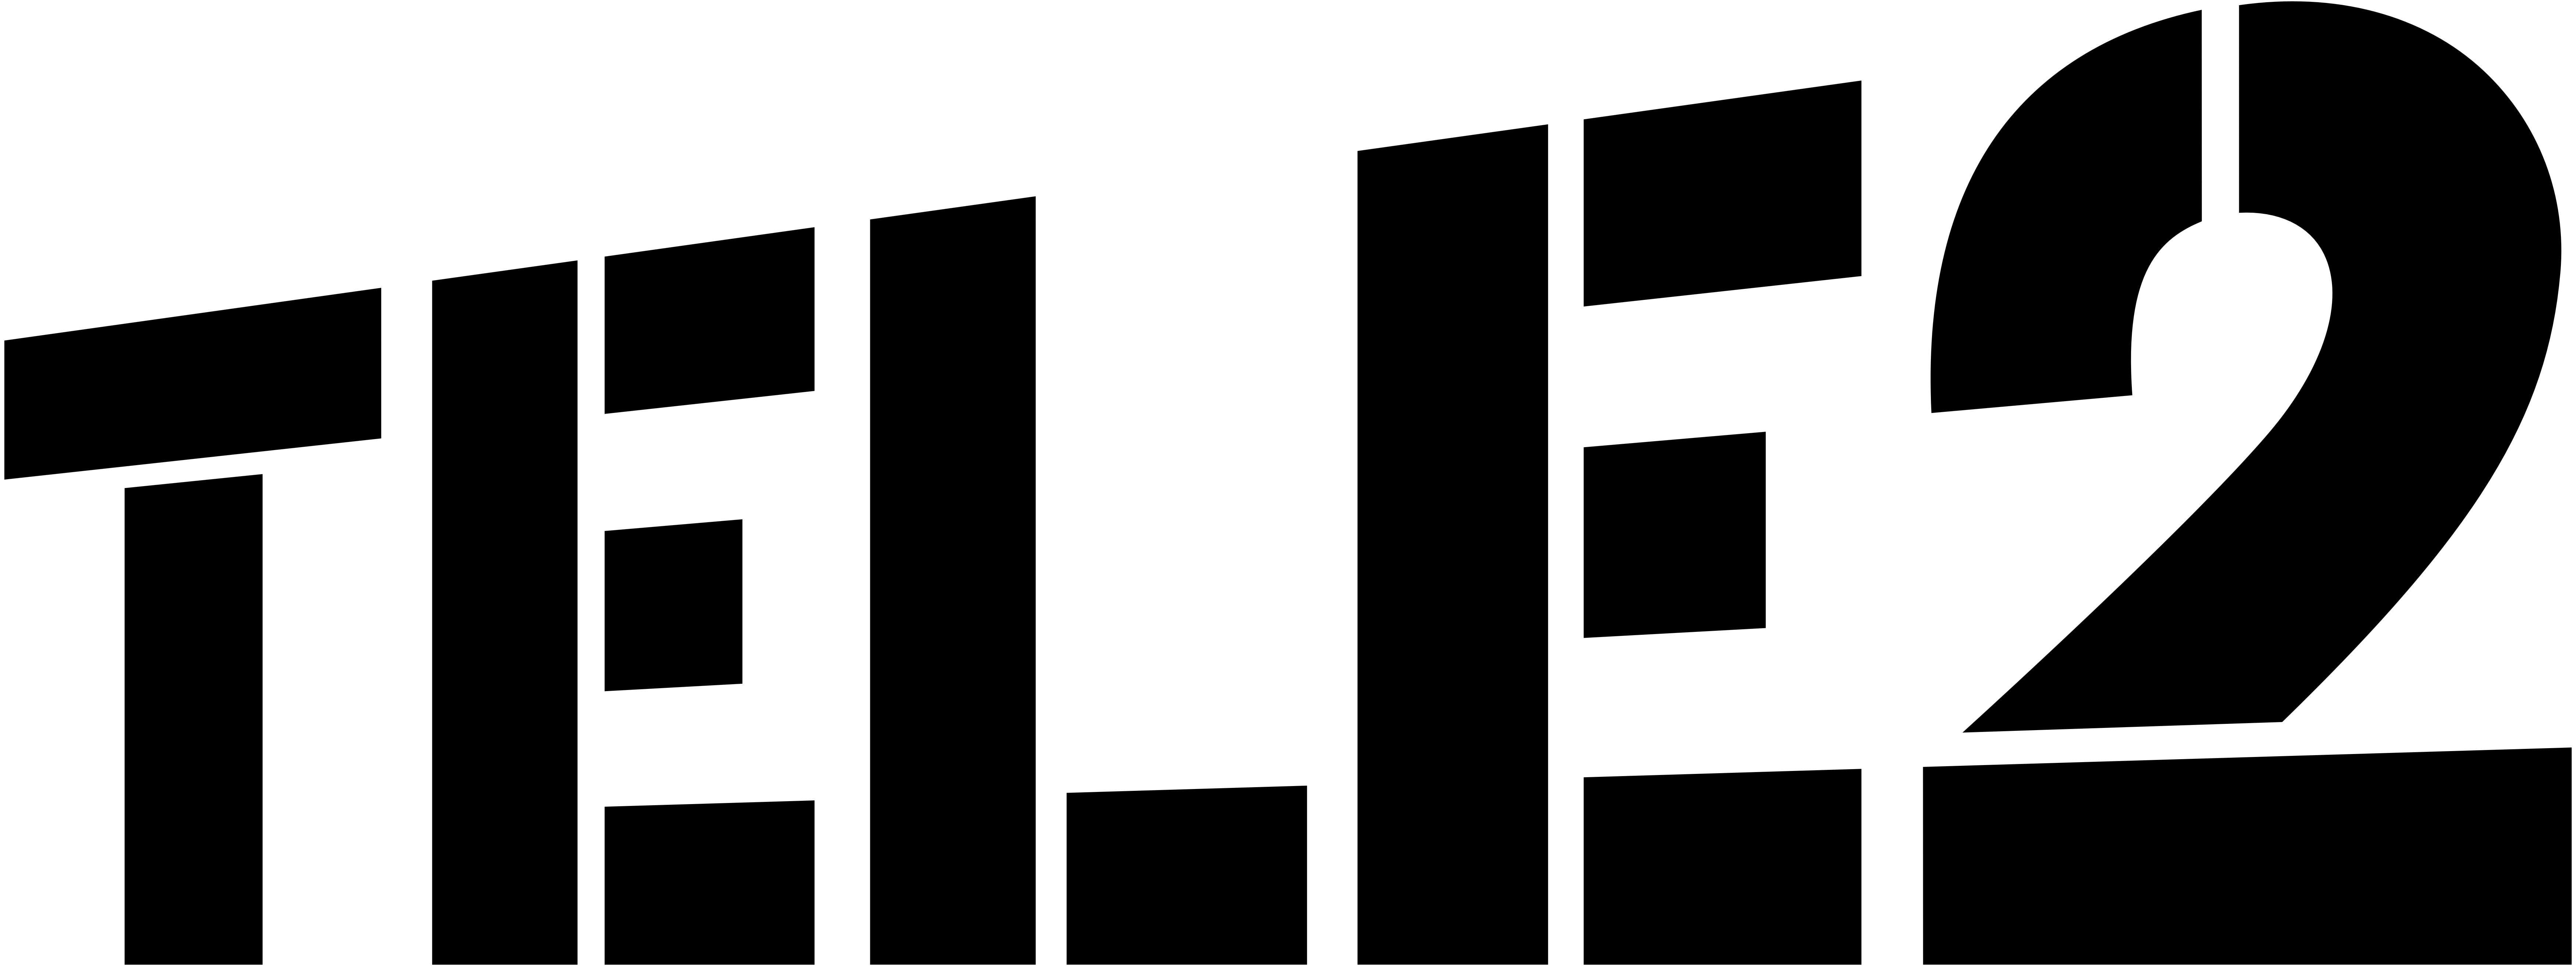 File:Tele2 logo.svg - Wikimedia Commons